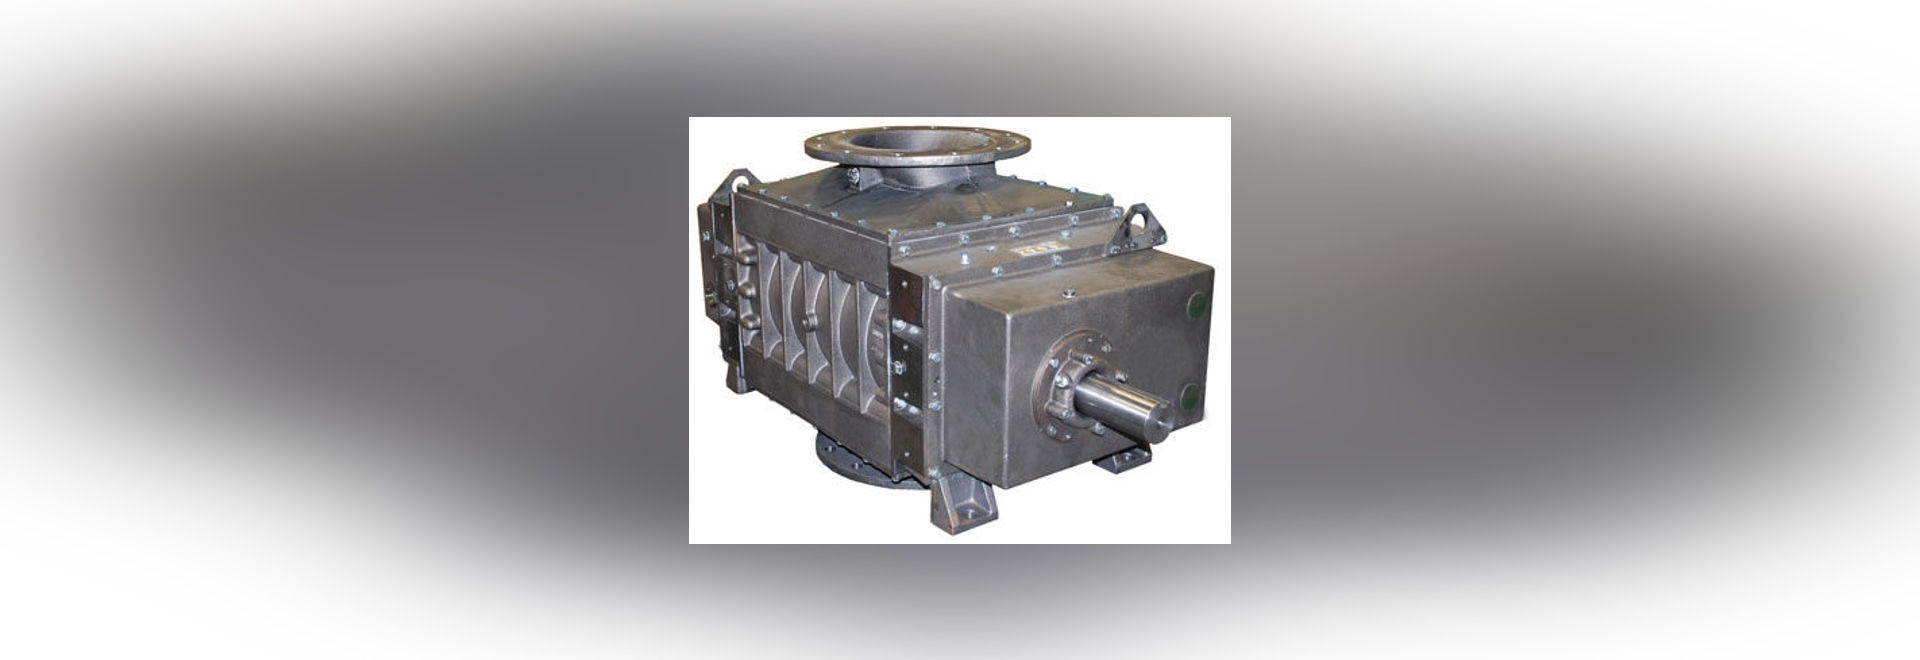 NEU: Gasgebläse by Tuthill Vacuum & Blower Systems